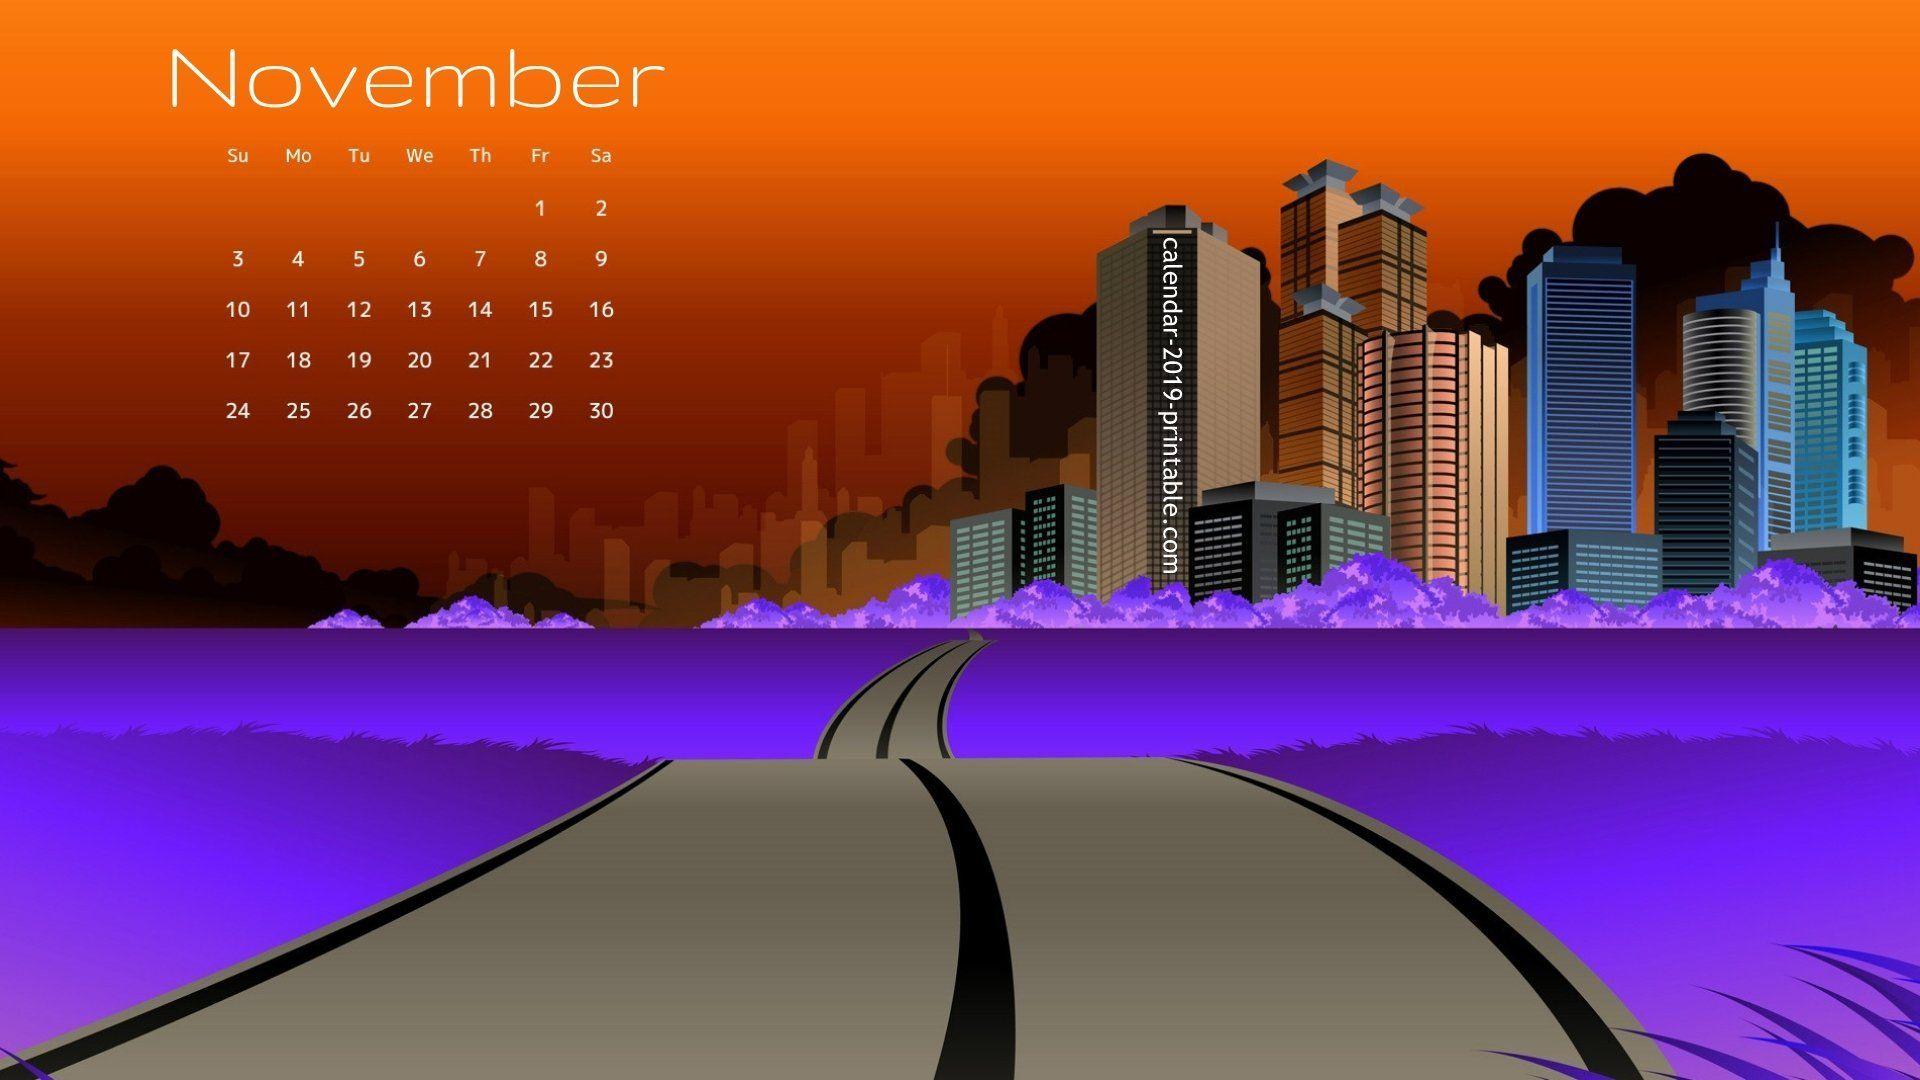 November 2019 Stylish Calendar Wallpaper Calendar 2019